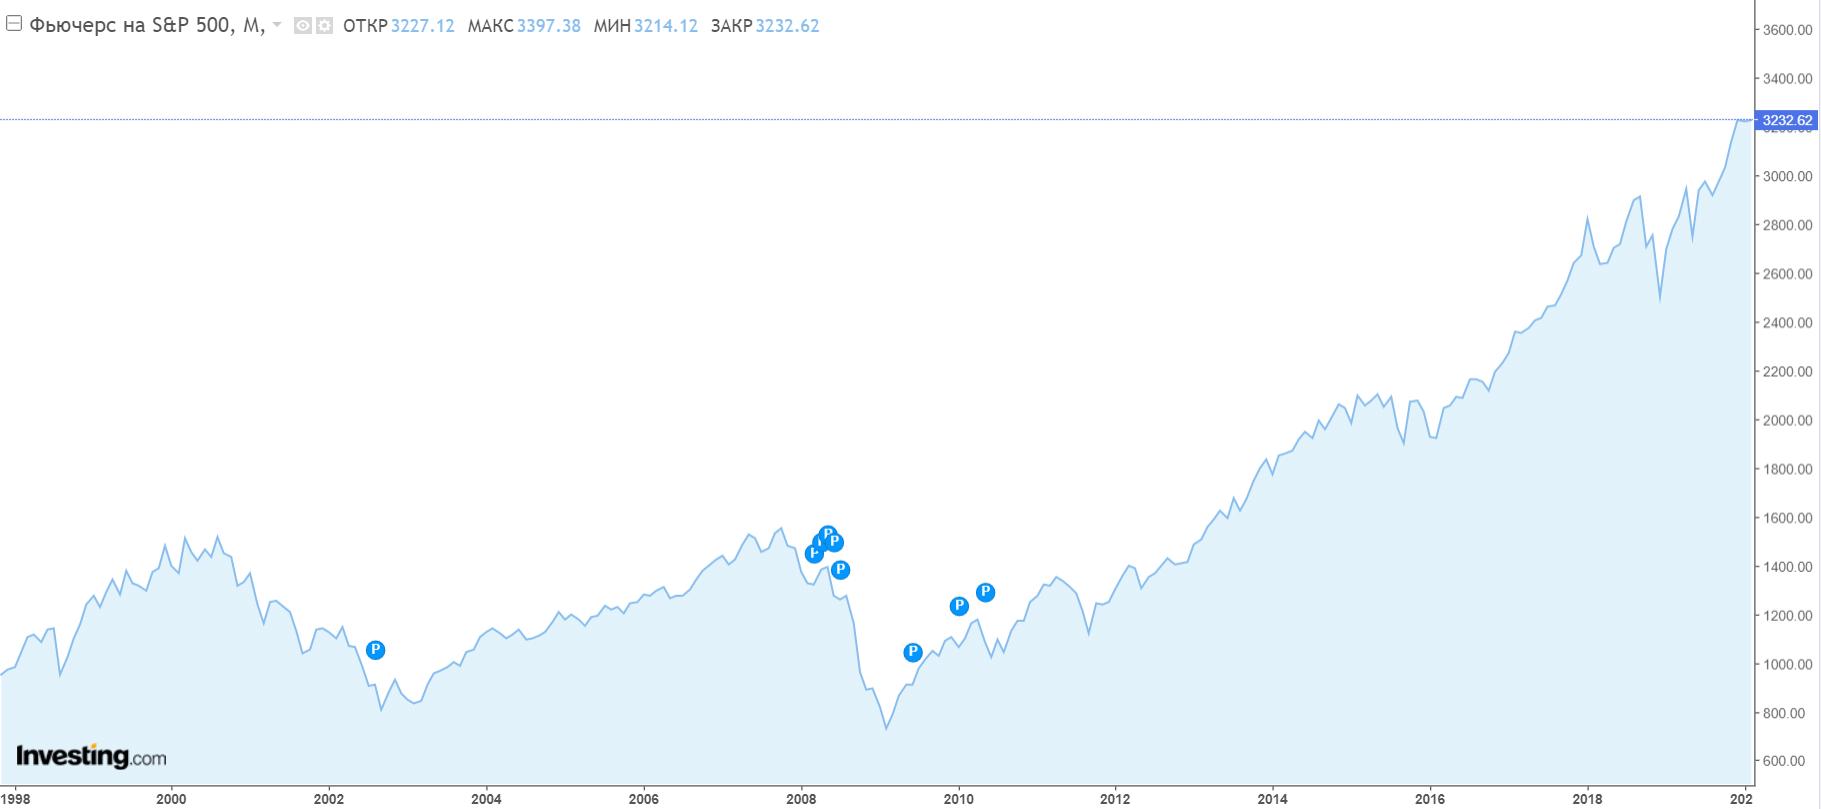 Изменение индекса S&P500